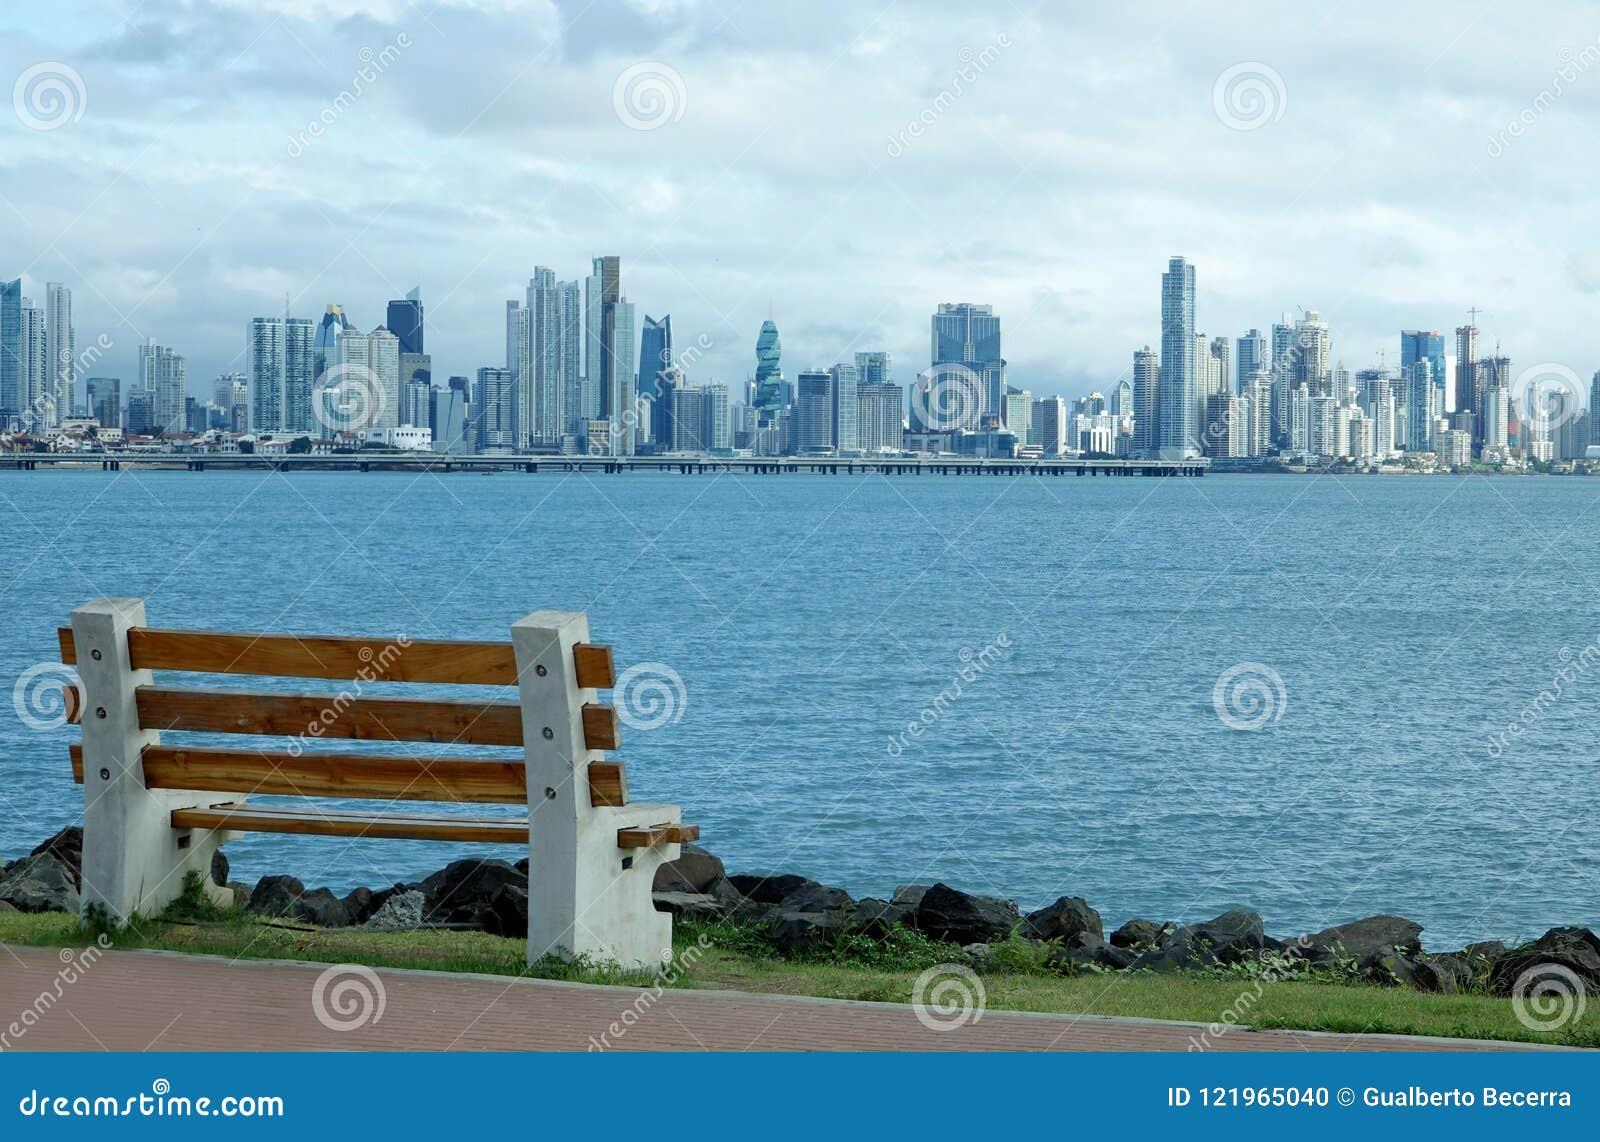 Взгляд от мощёной дорожки в Amador горизонта Панама (город)